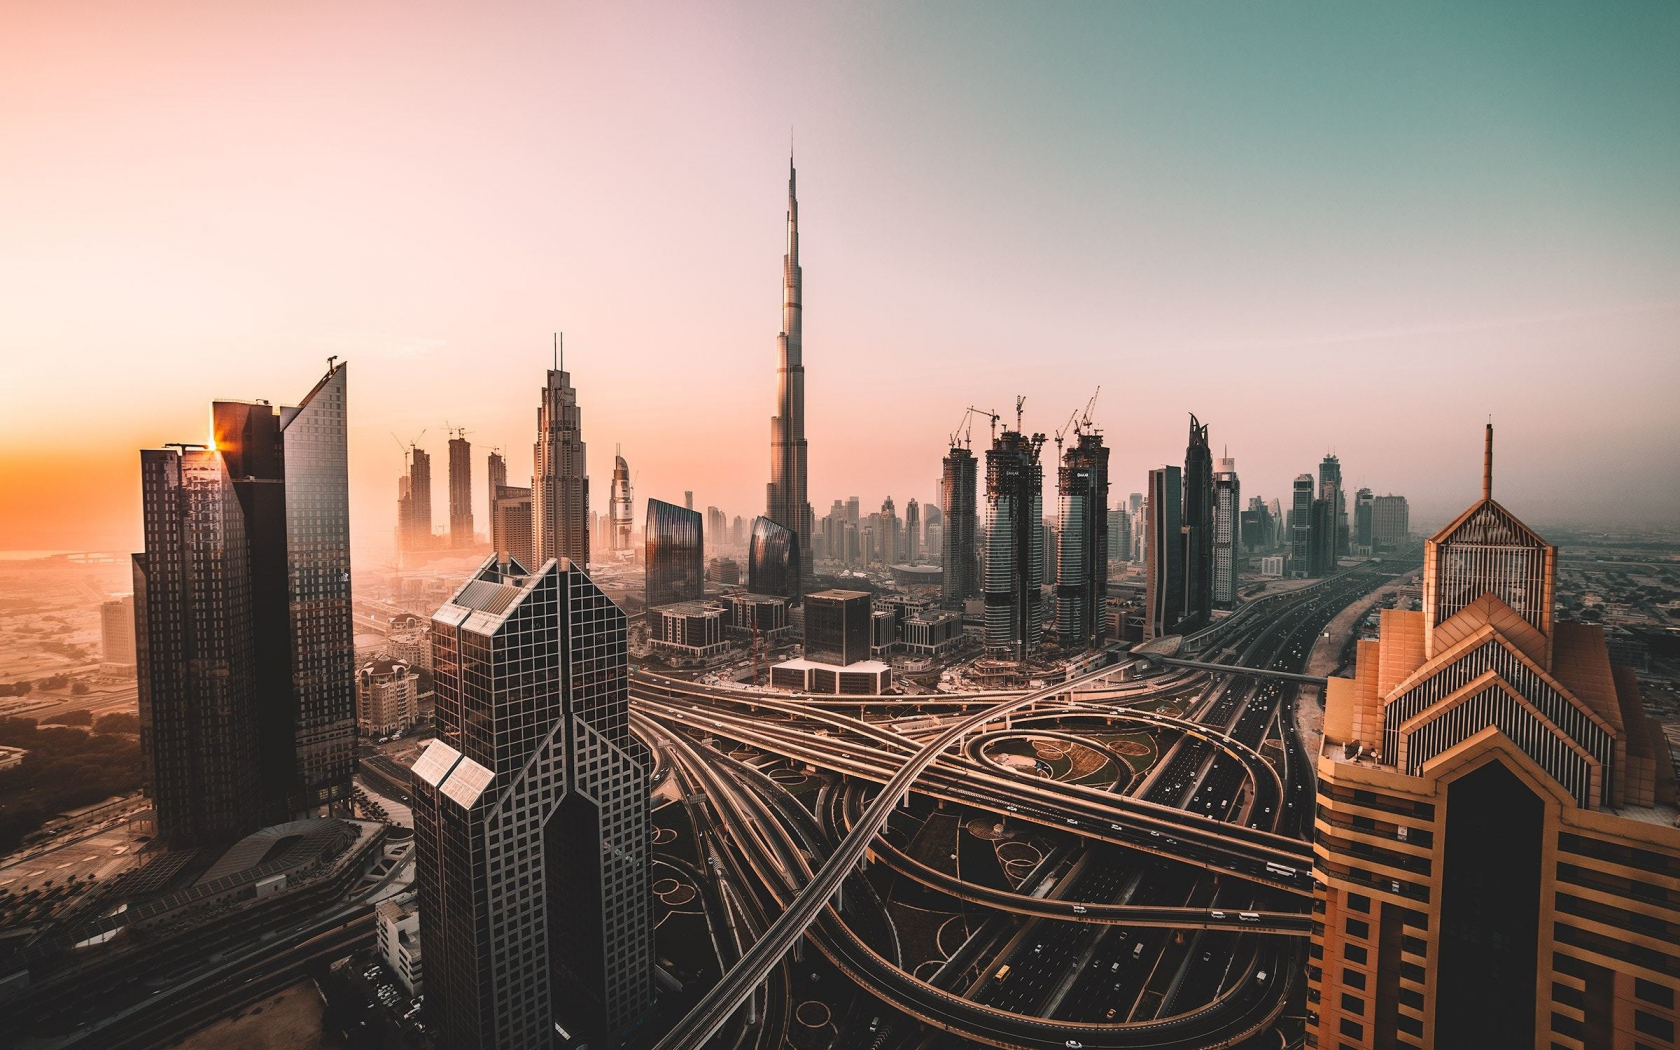 Dubai, skyline, cityscape, skyscrapers, buildings, Burj Khalifa, city, 1680x1050 wallpaper